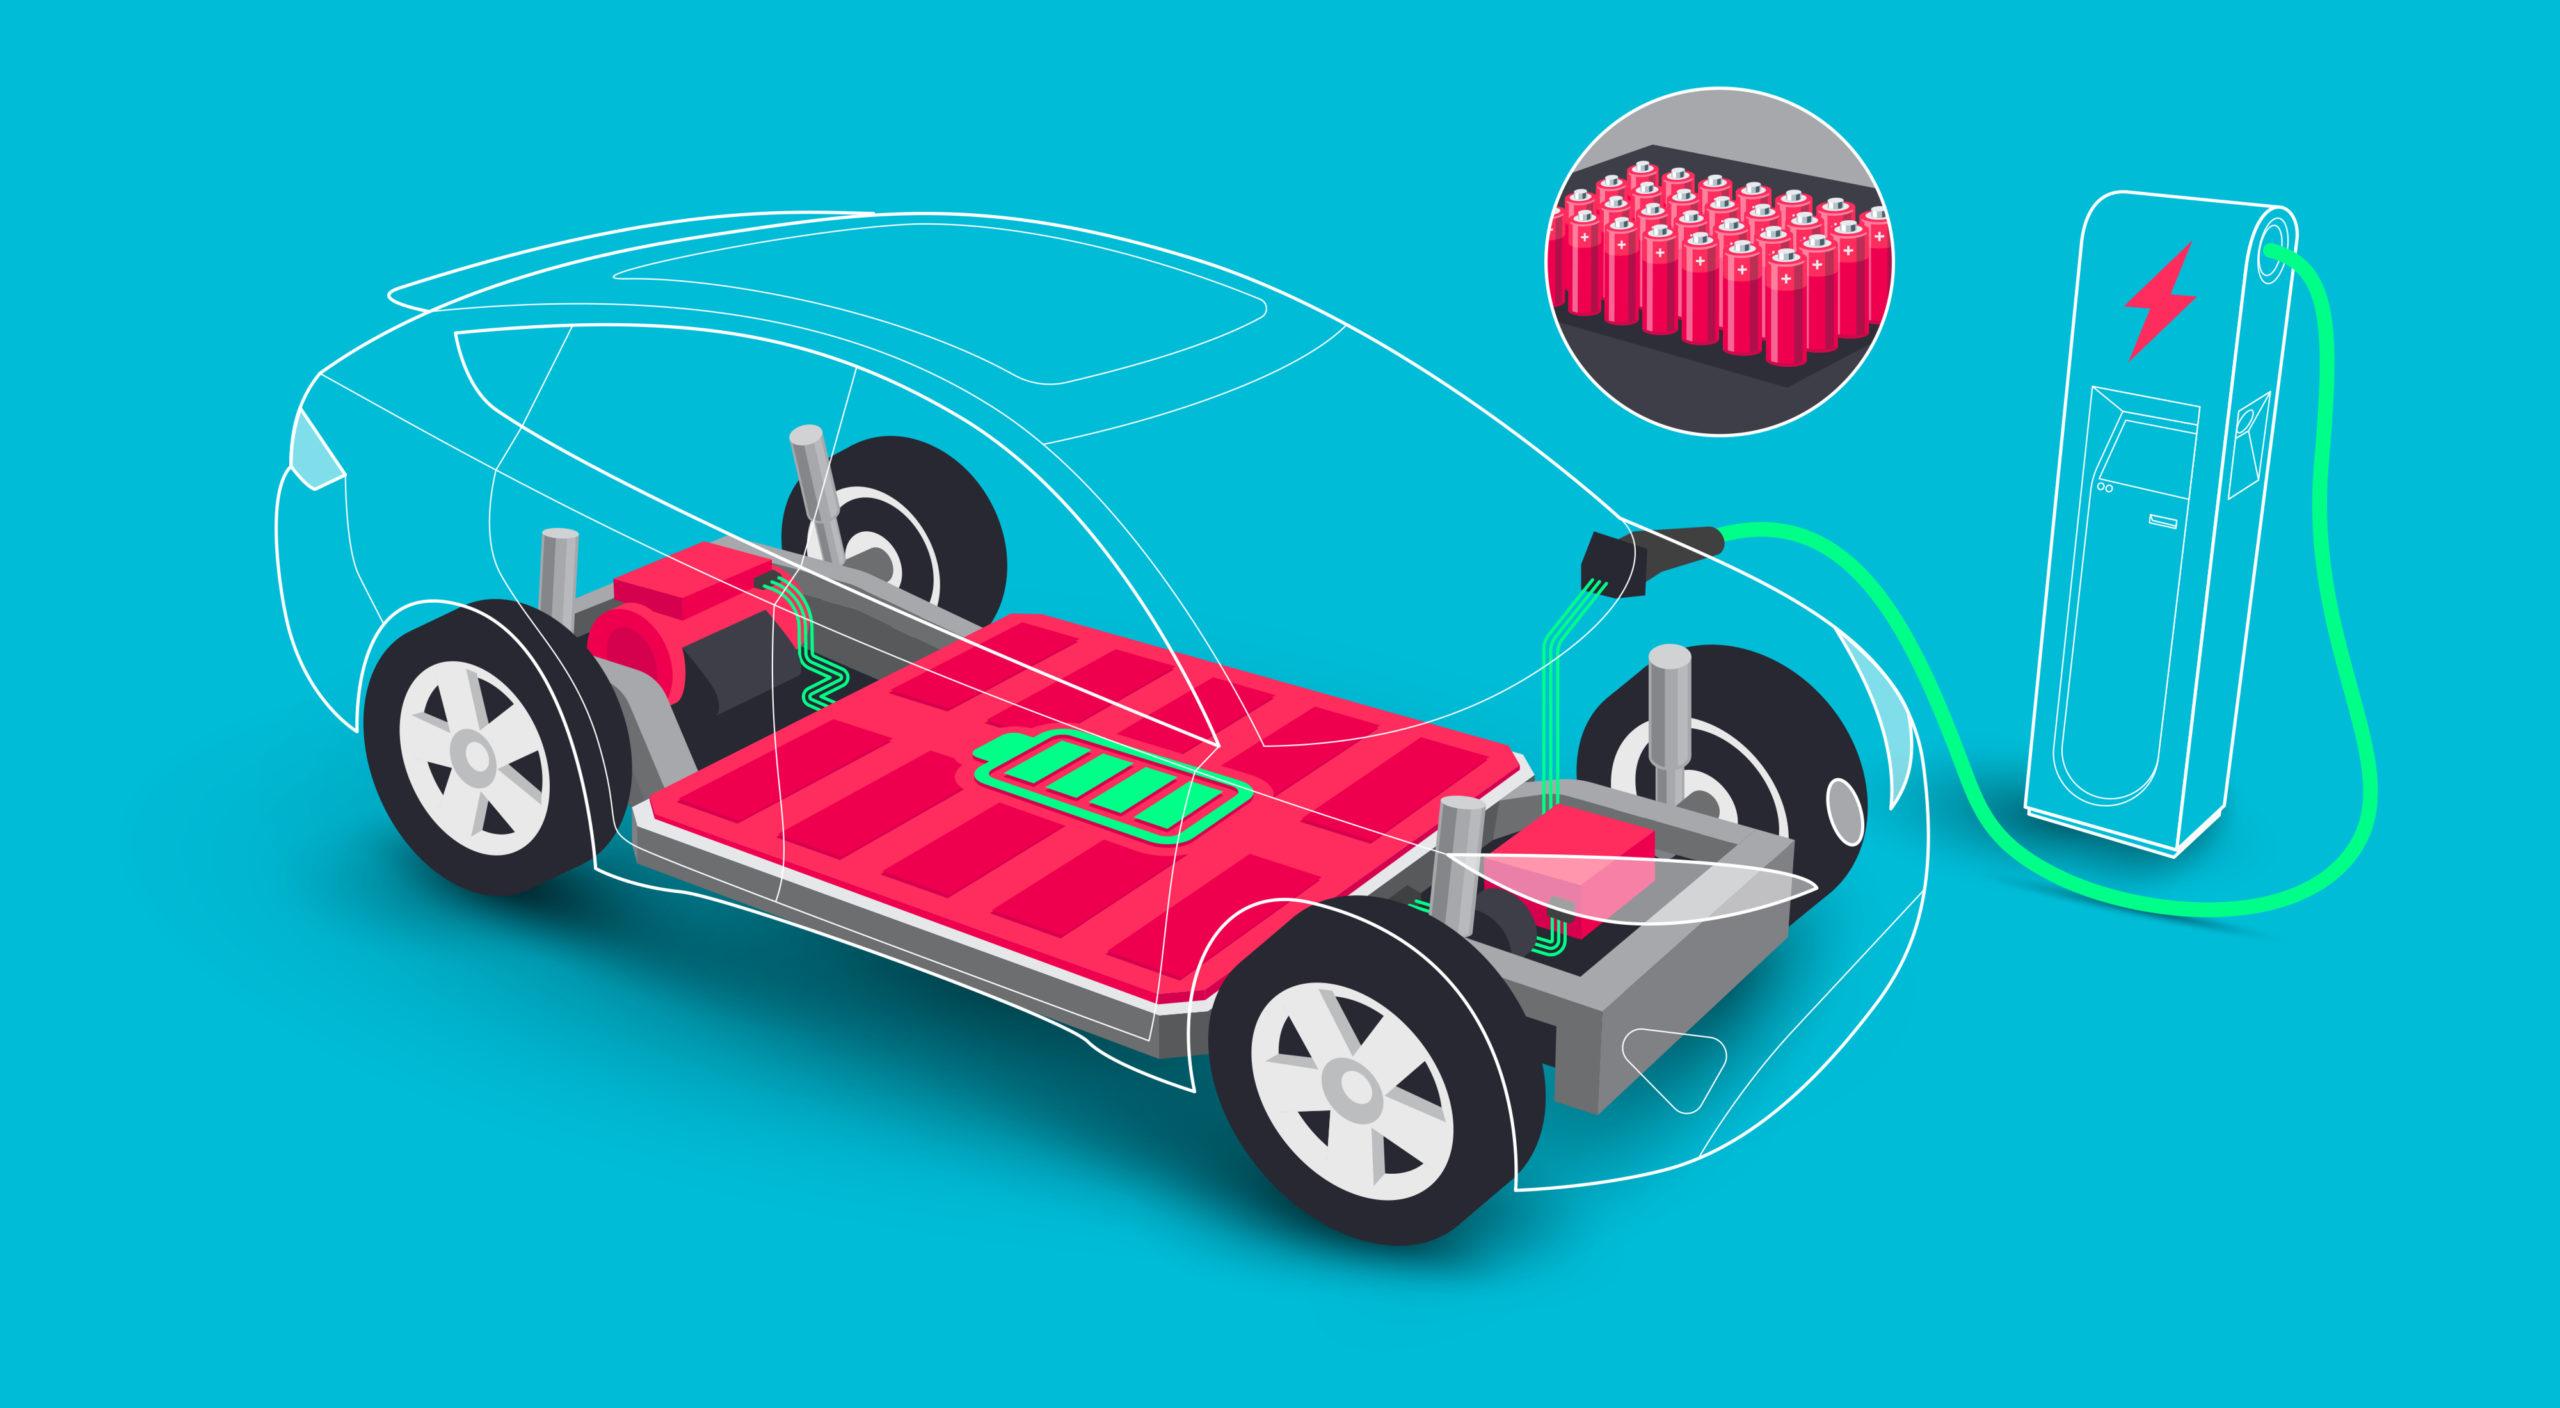 Cartoon depicting electronic drivetrain